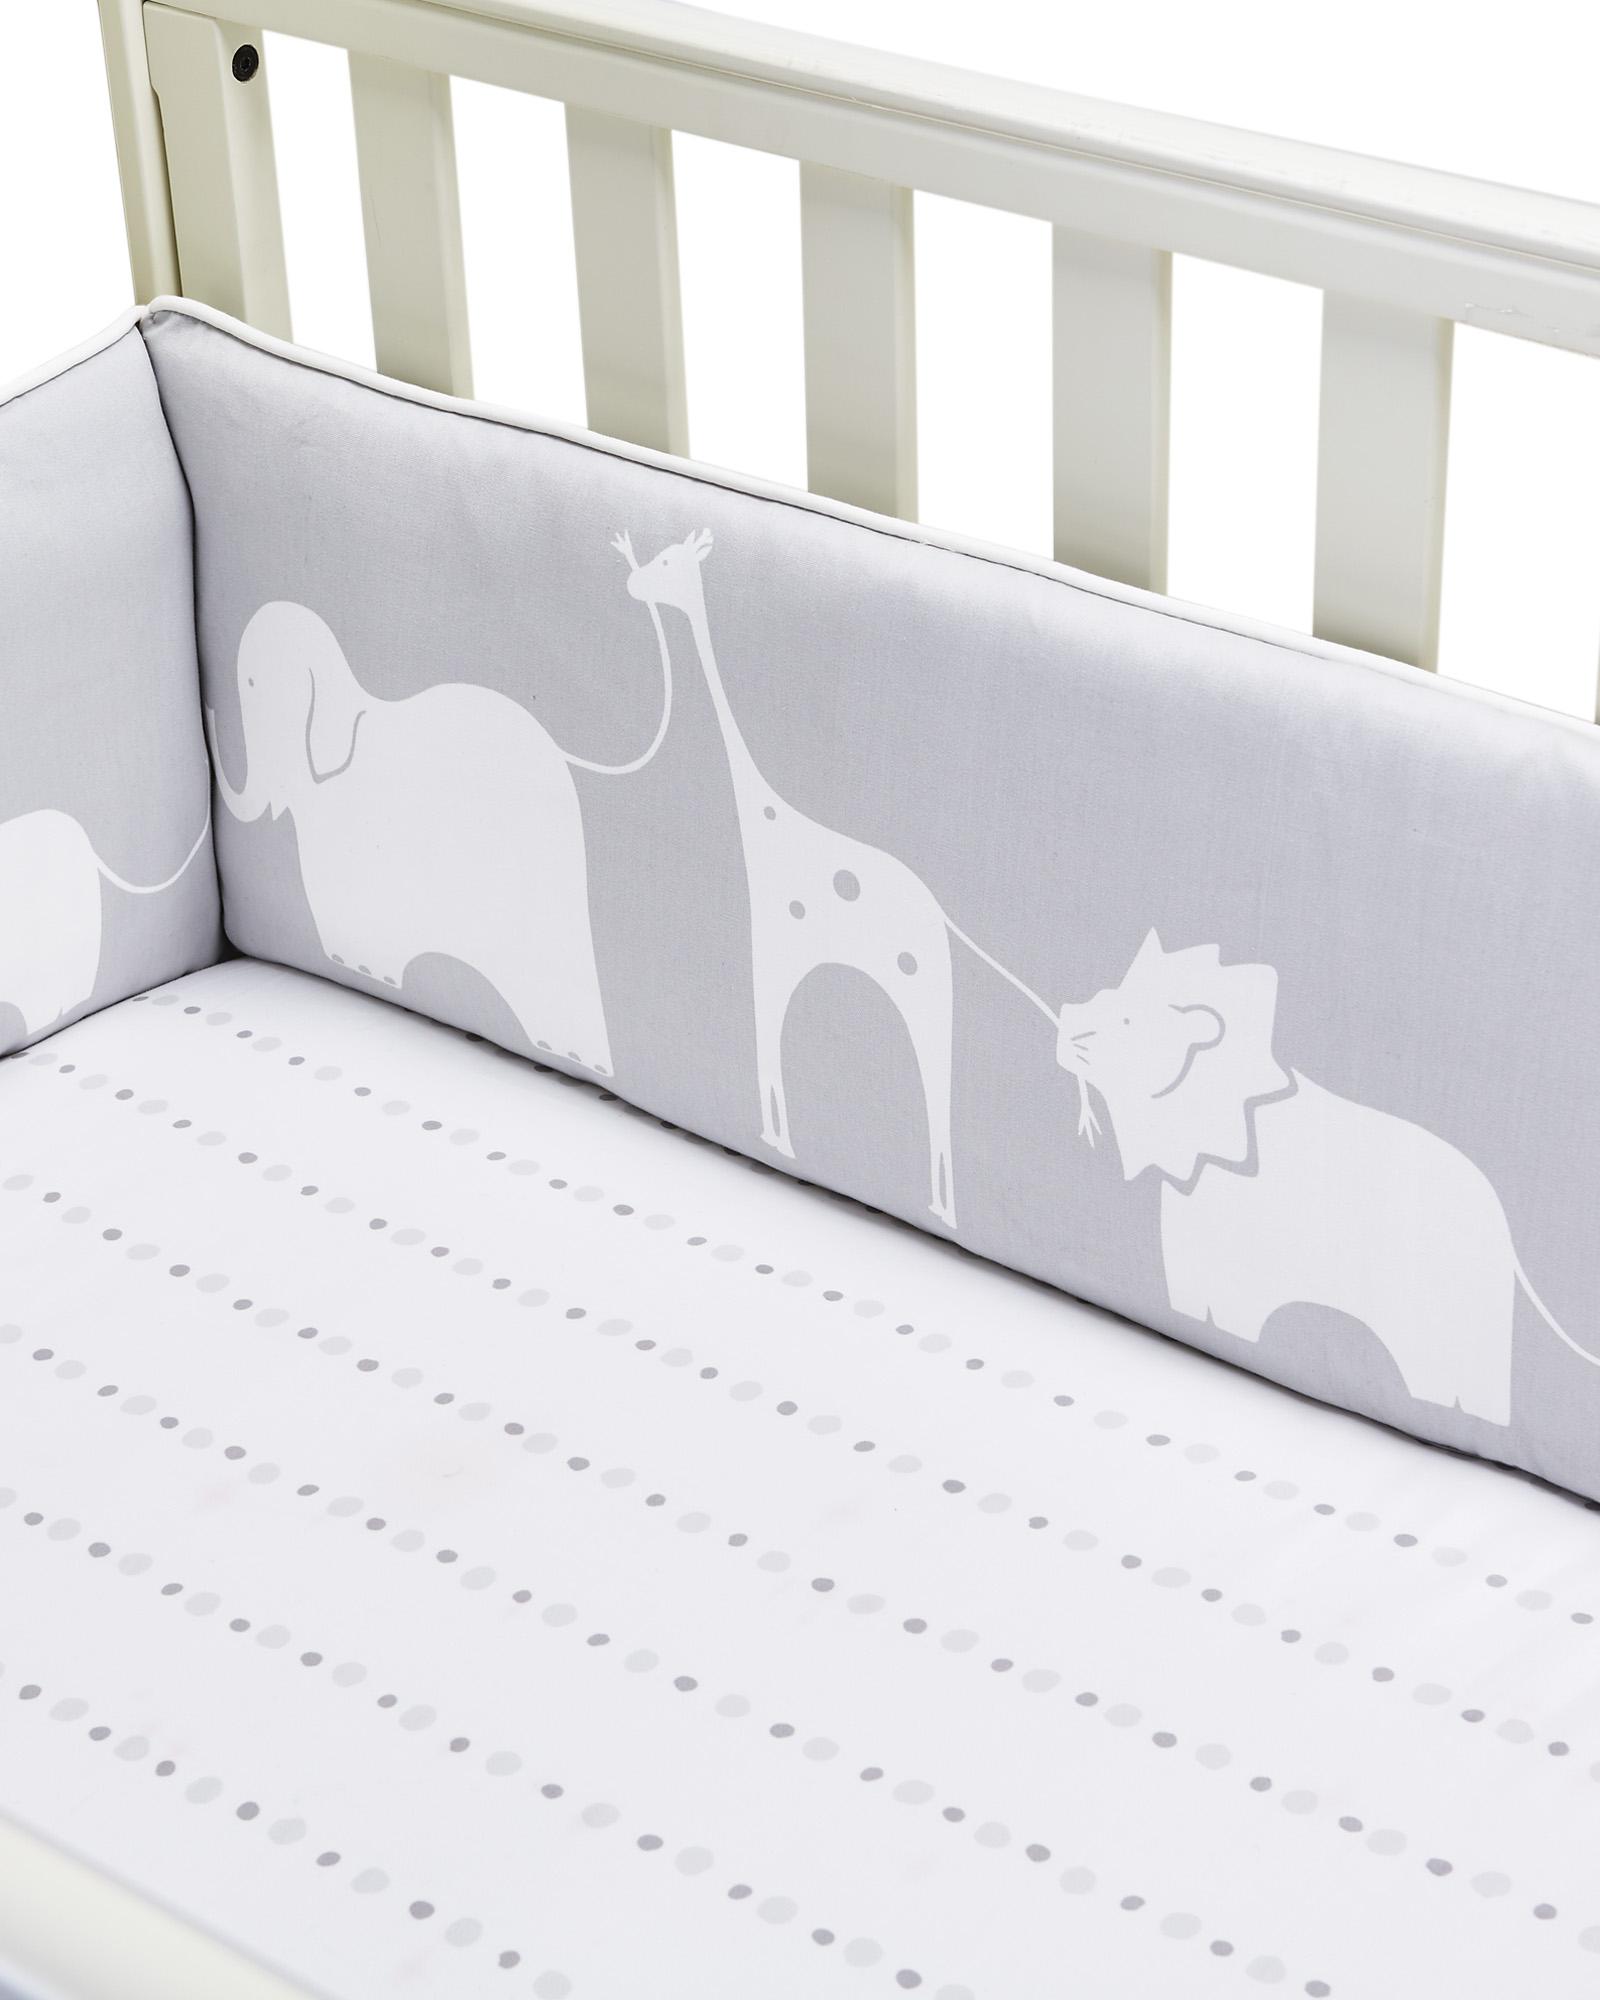 Bumper Pads in Cribs Safety | Crib Bumper Pads | Bumper Pad Crib